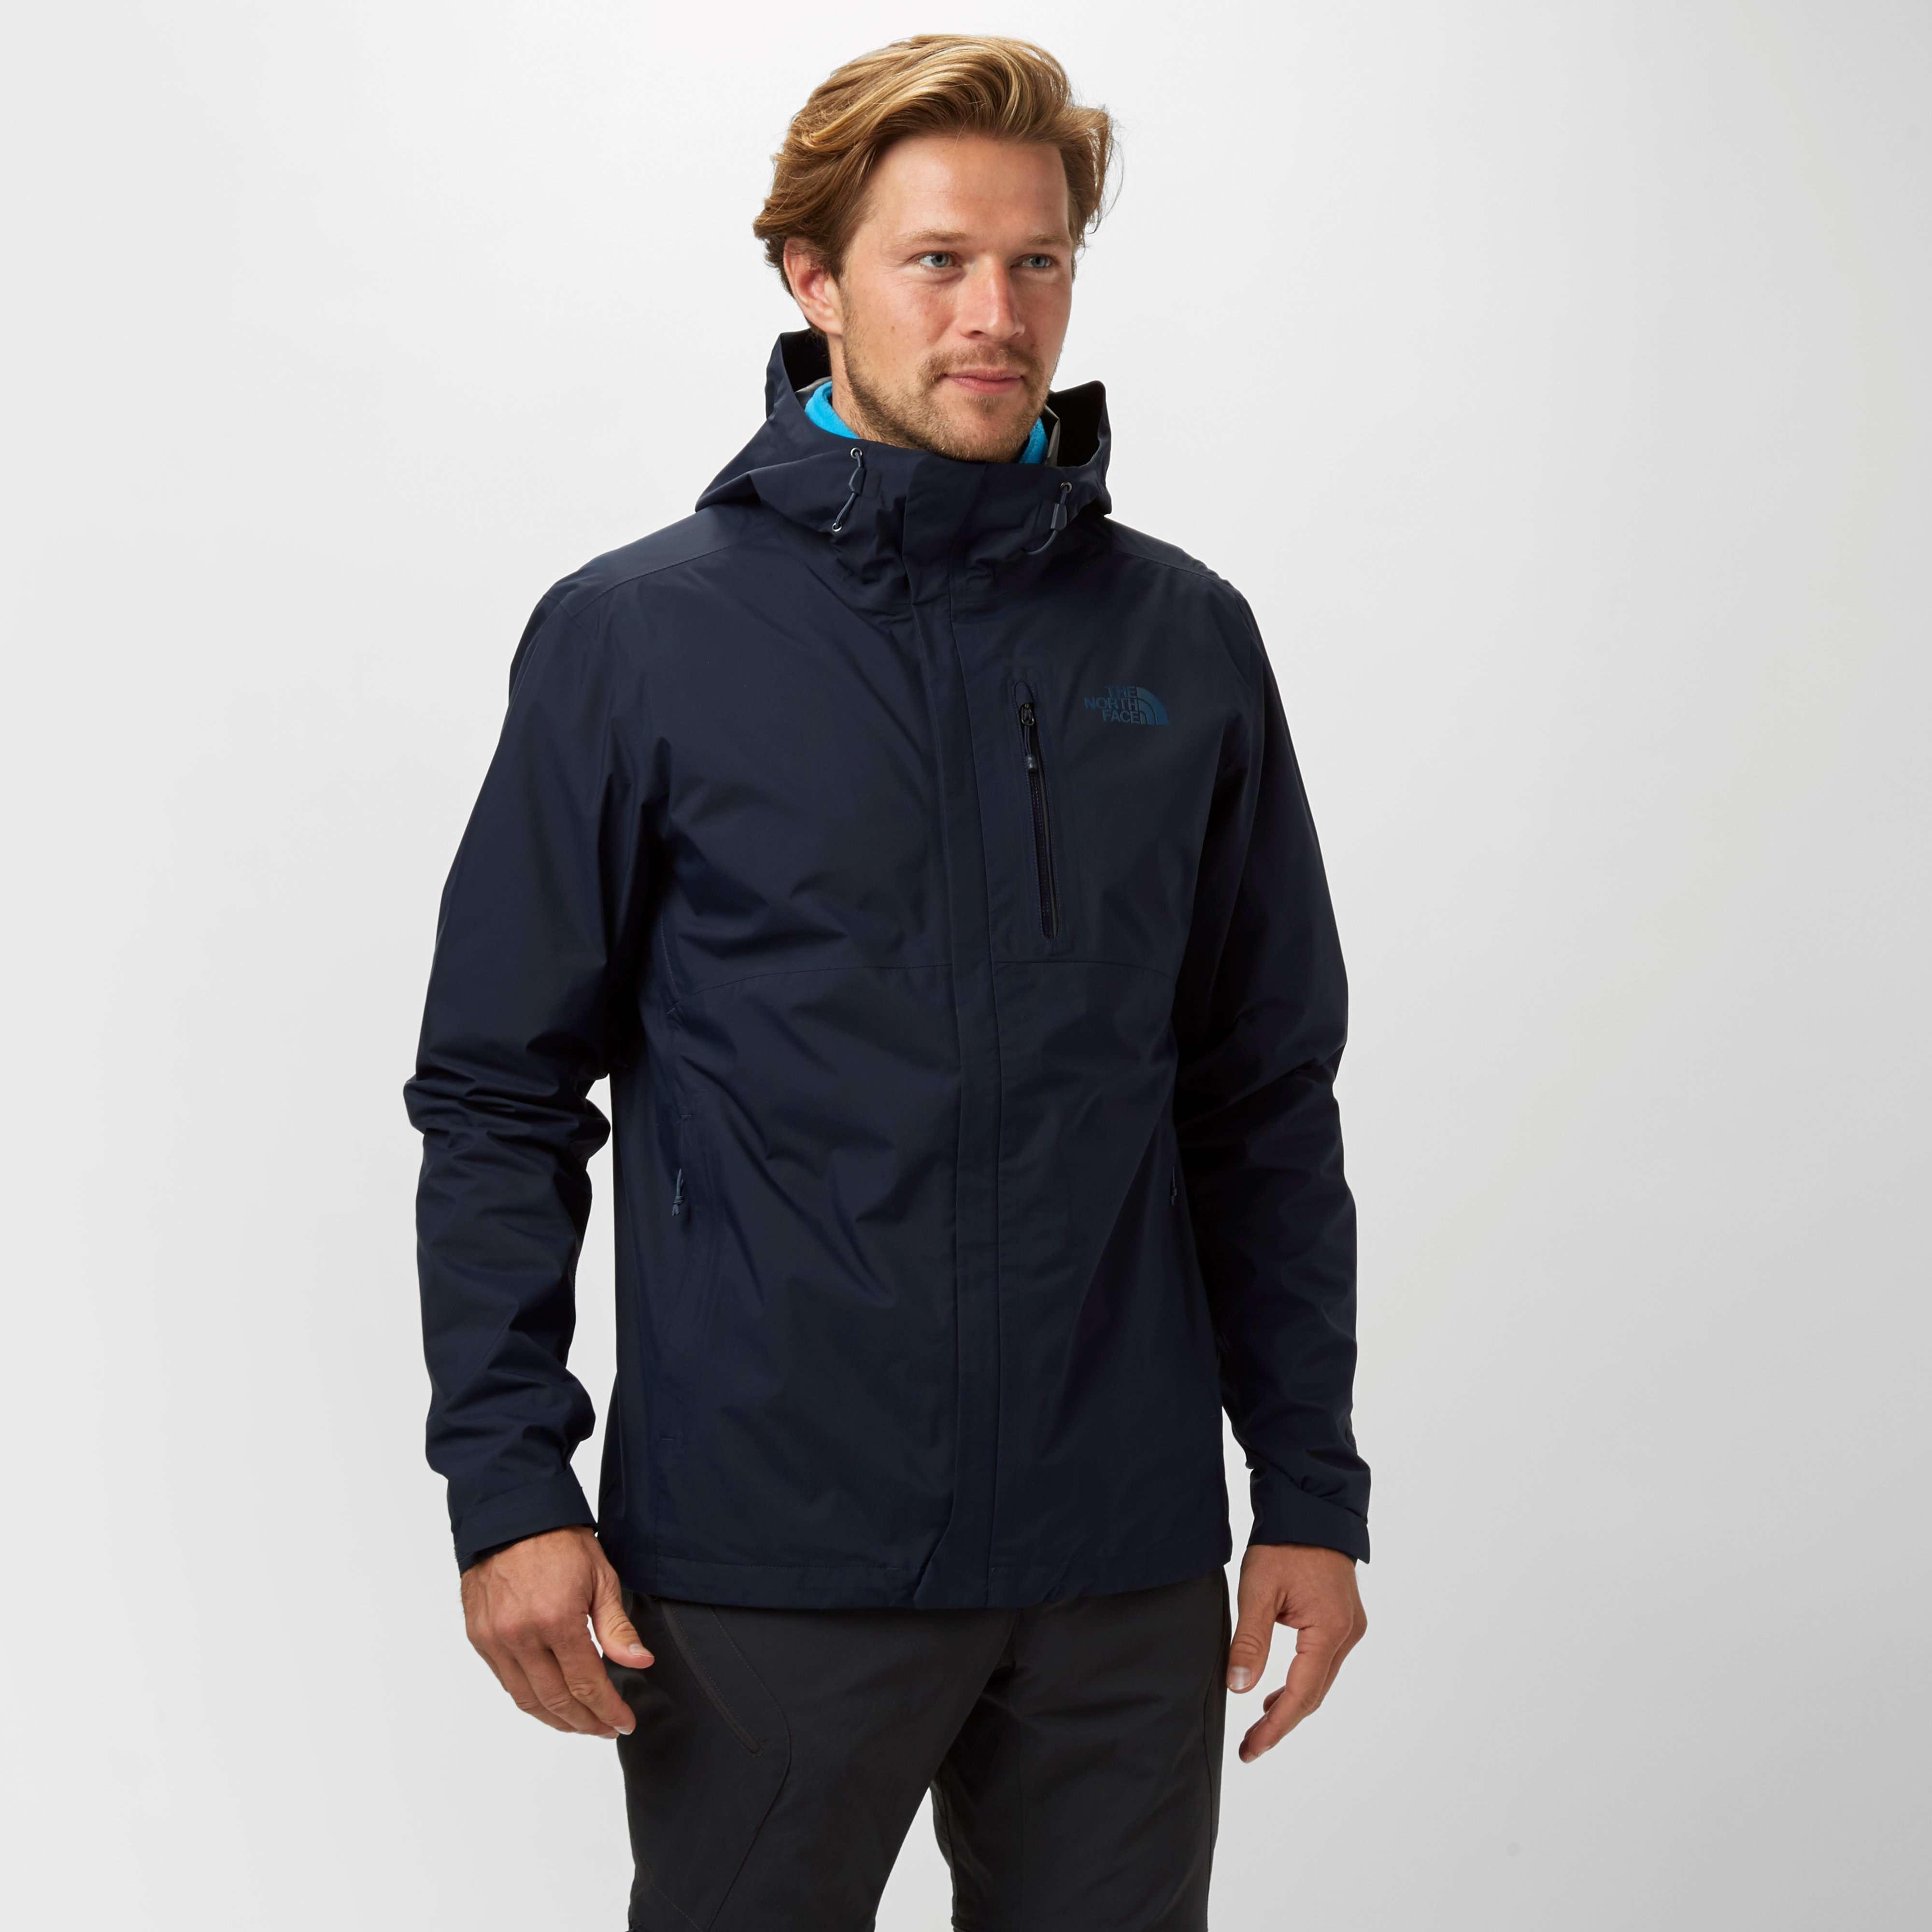 THE NORTH FACE Men's Dryzzle GORE-TEX® Jacket